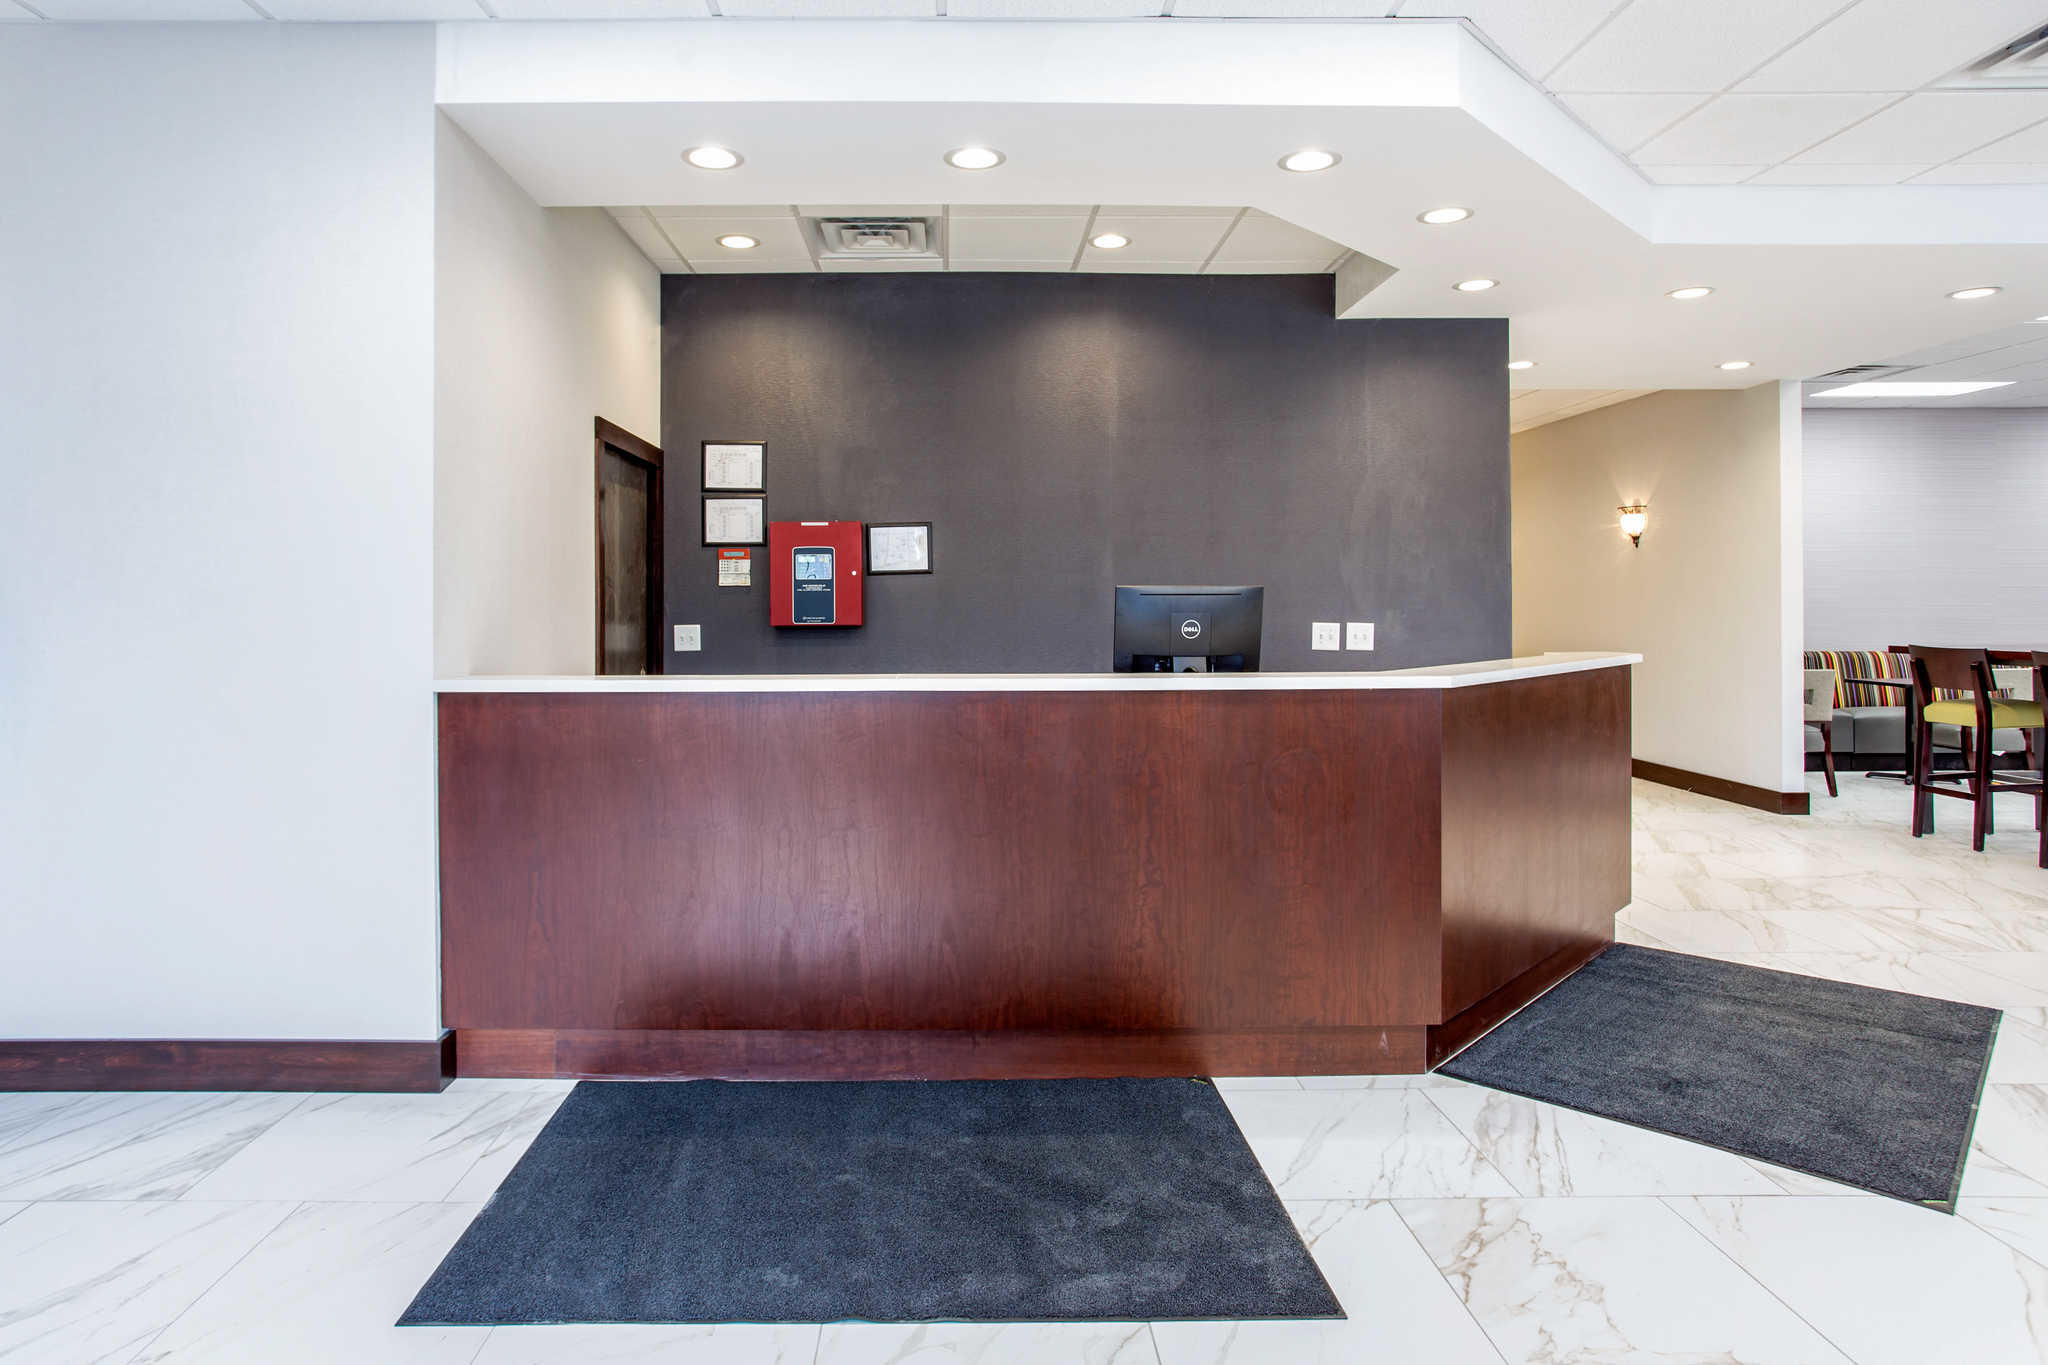 Clarion Inn & Suites image 3